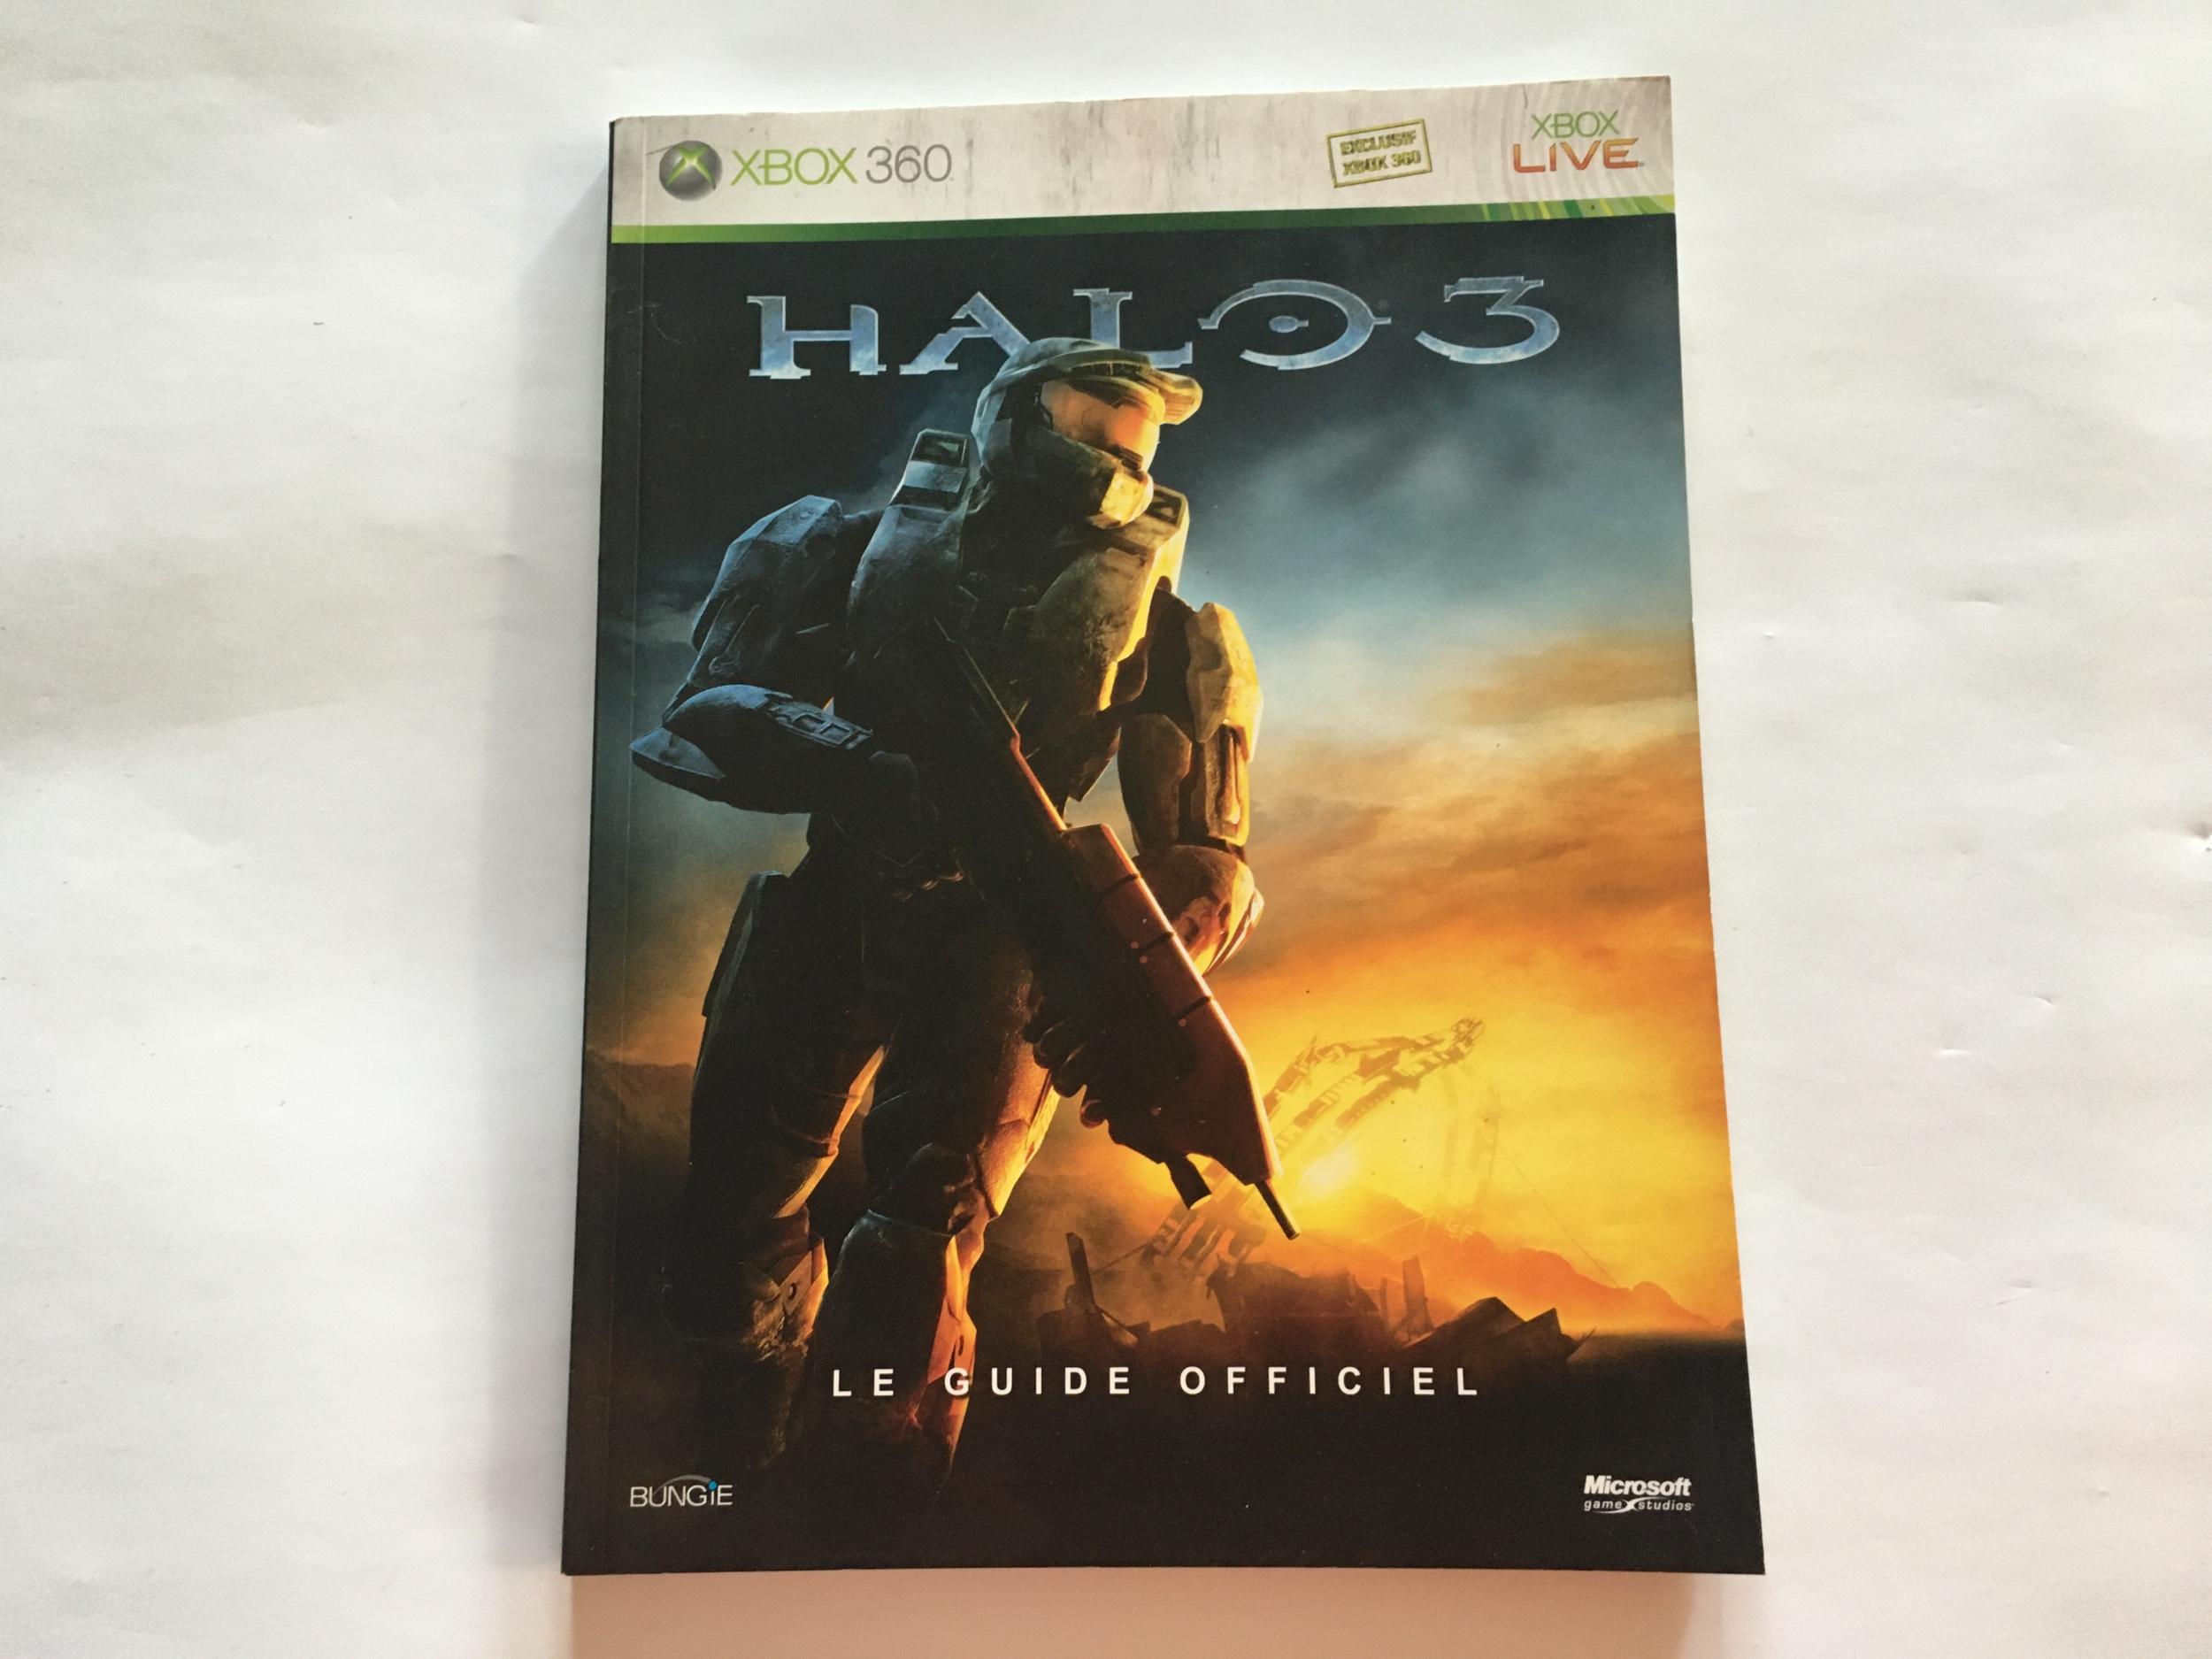 Guide Officiel Halo 3 FR occasion